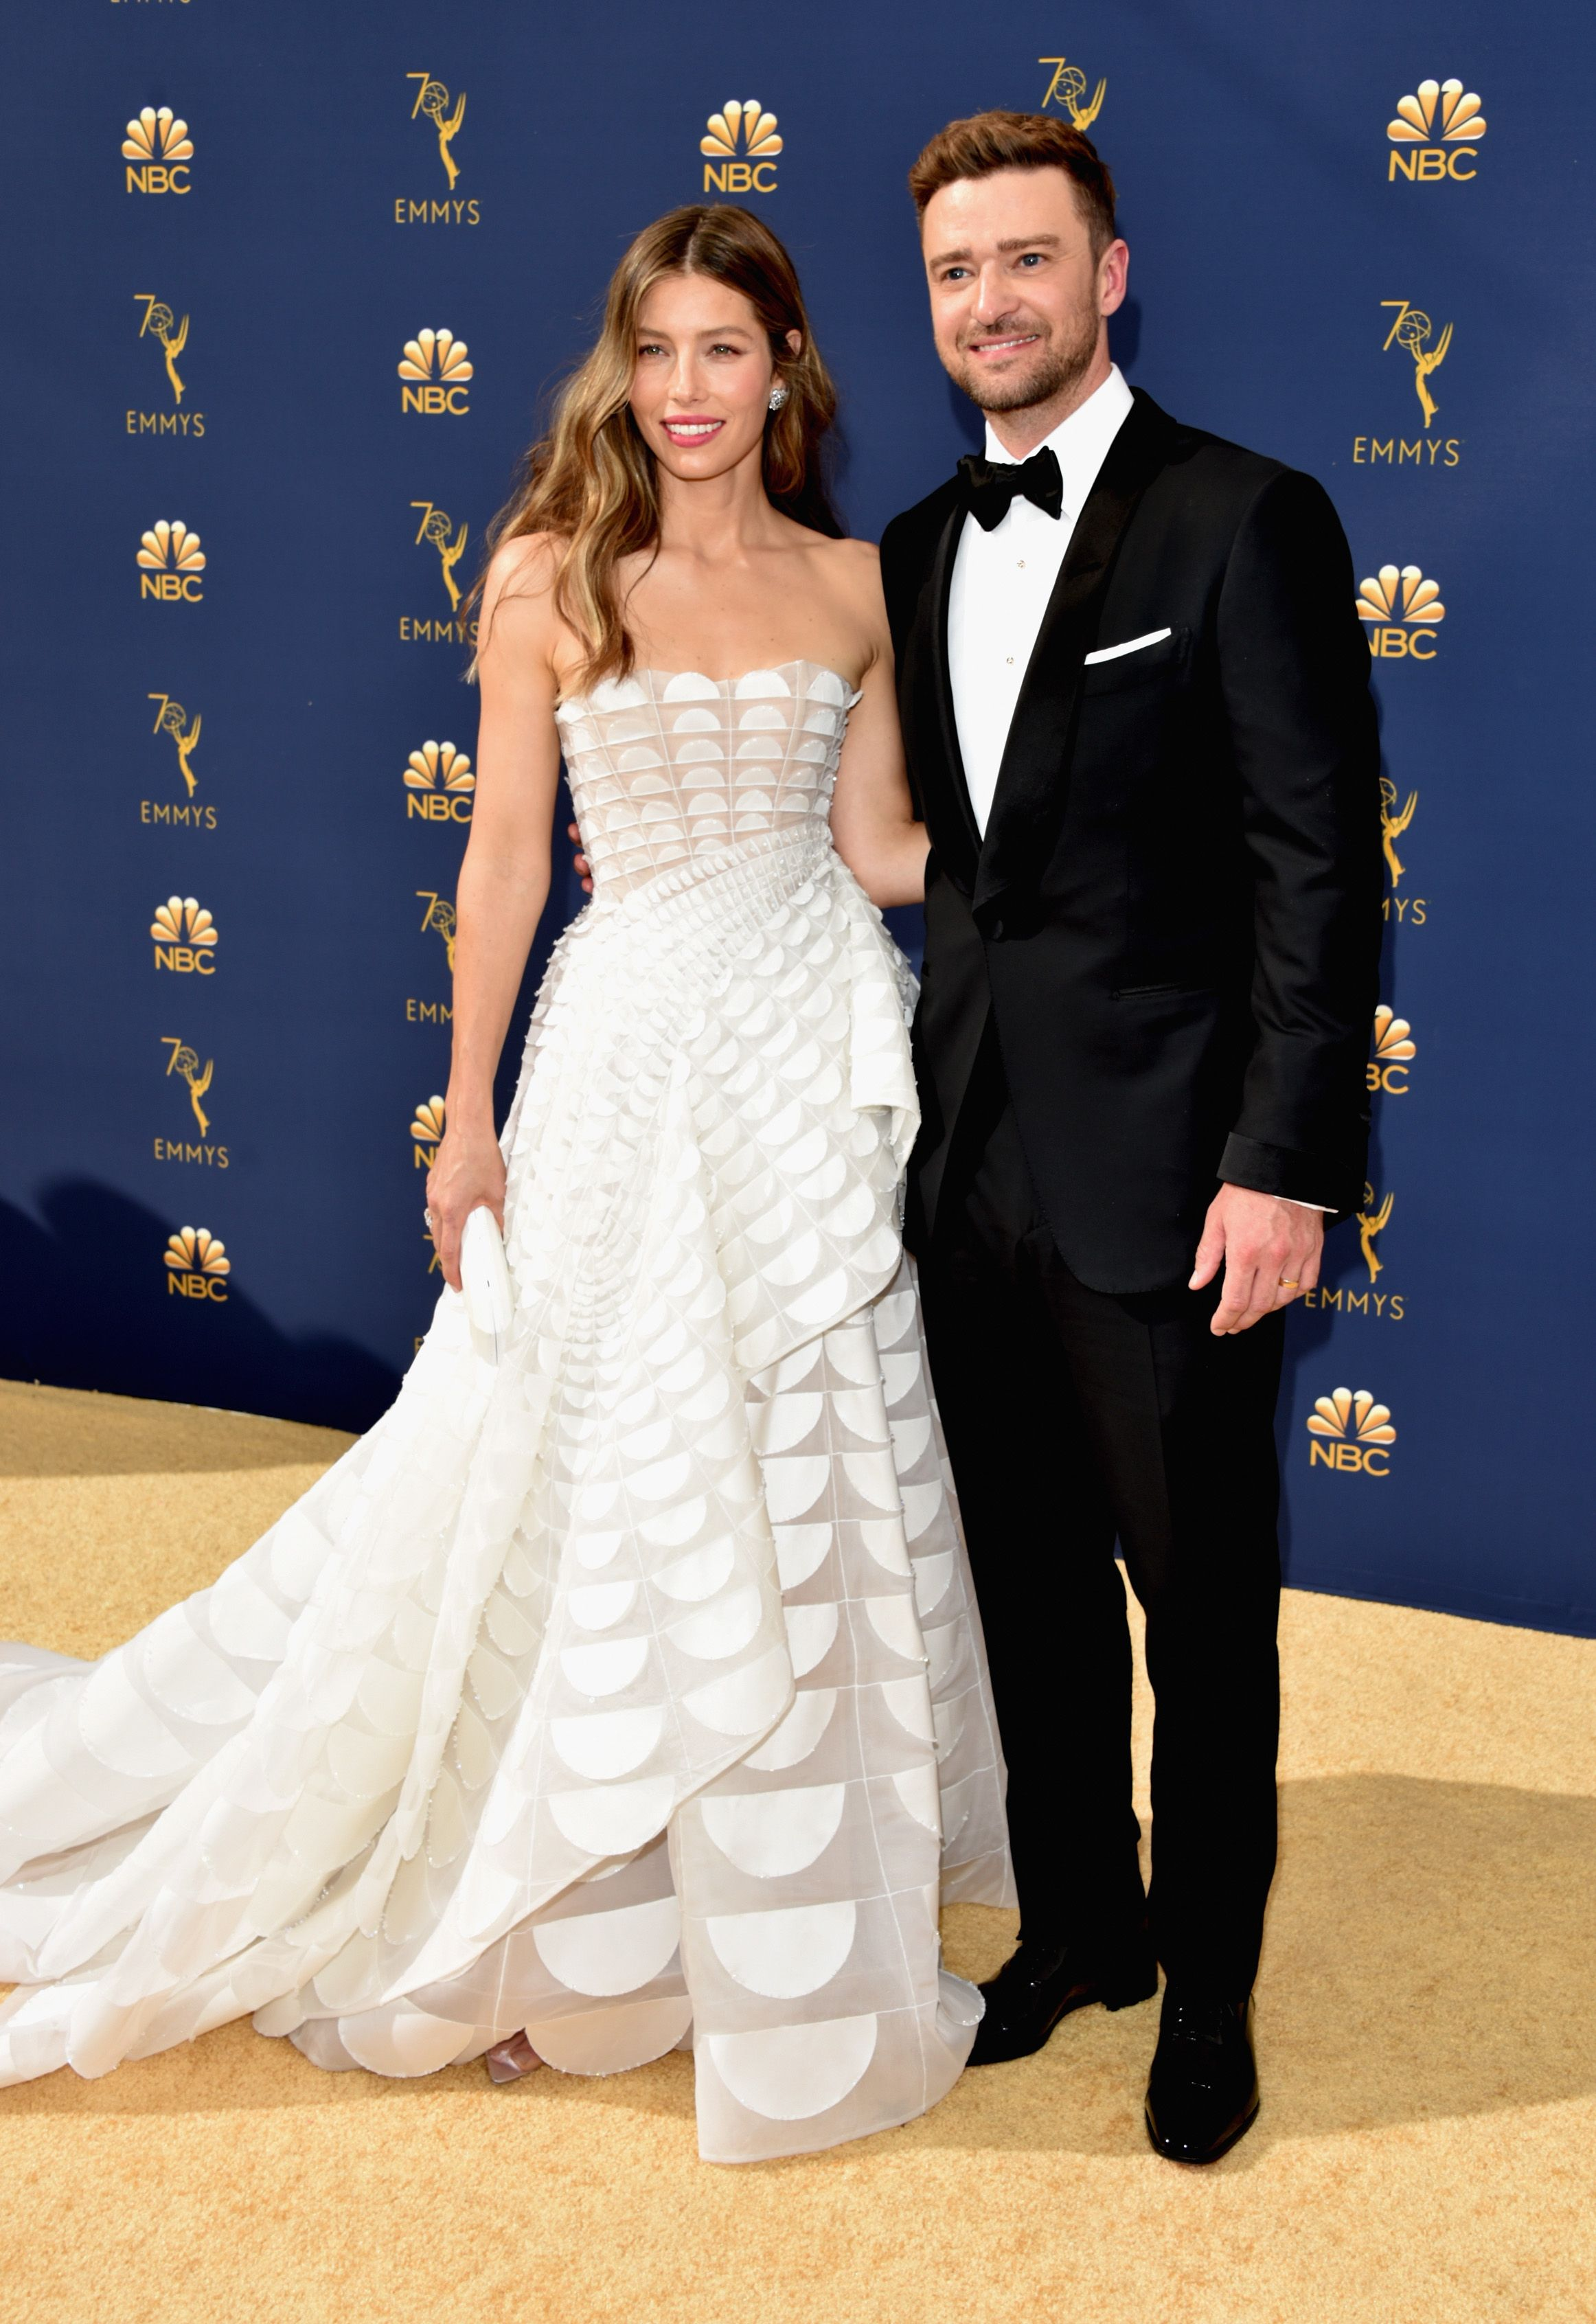 Justin Timberlake and Jessica Bielat the Emmys